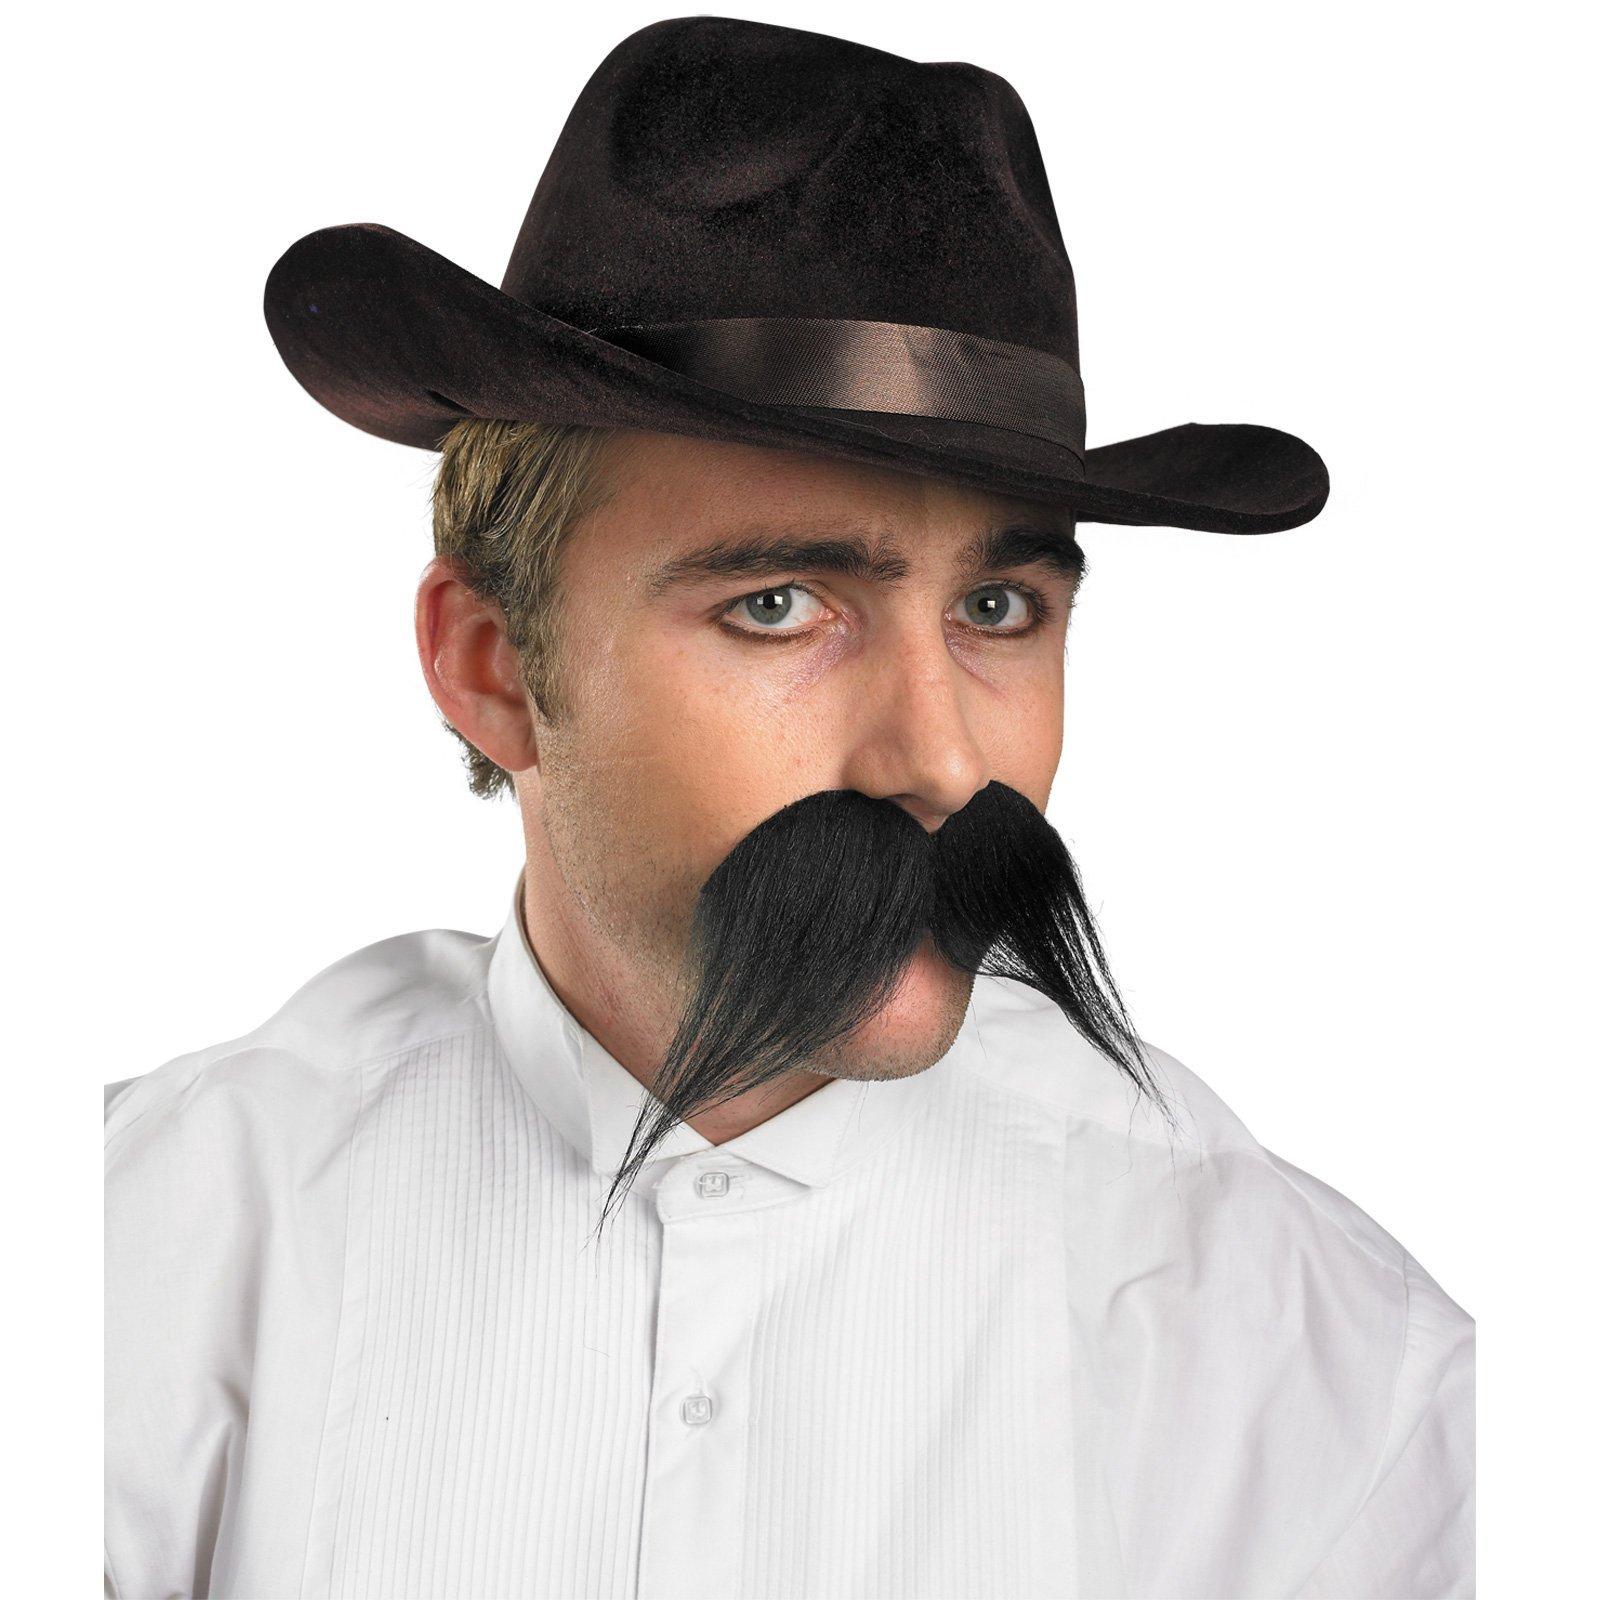 Disguise, Gambler Mustache, Adult